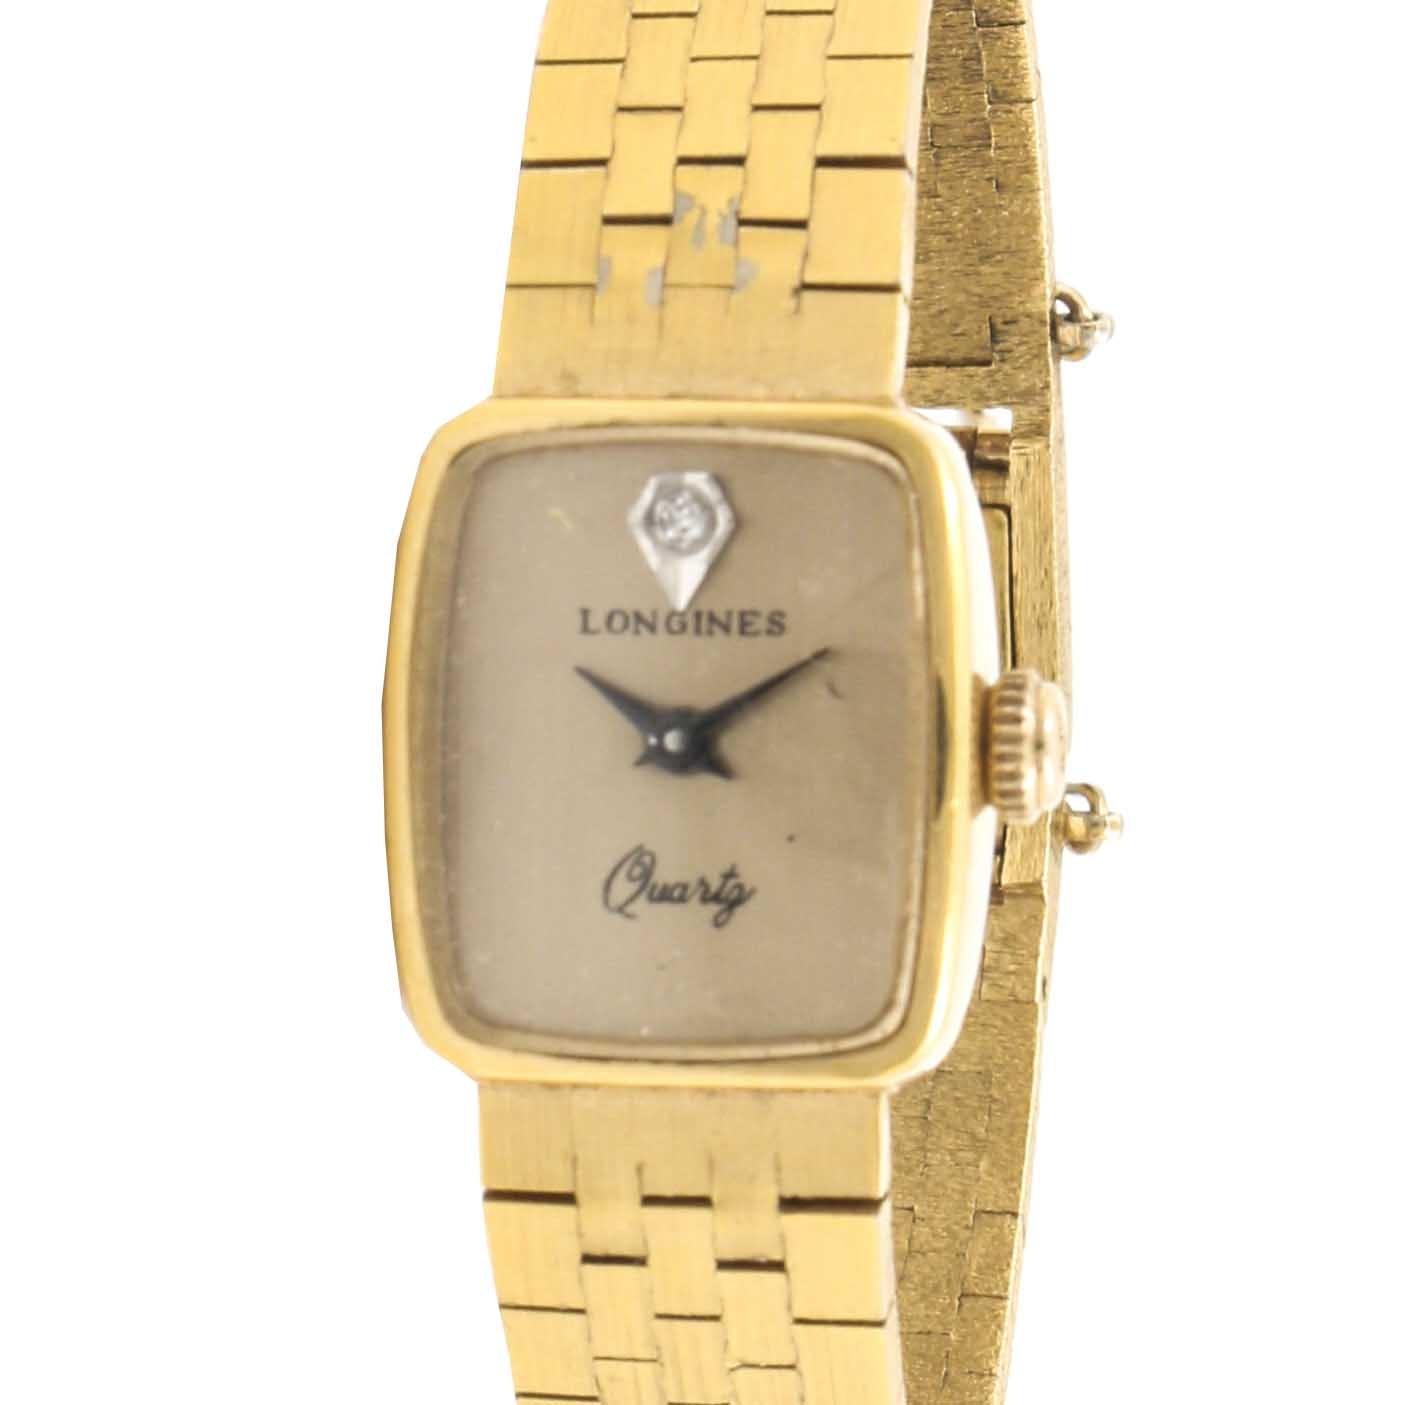 Longines Gold Tone Wristwatch With Diamond Accent